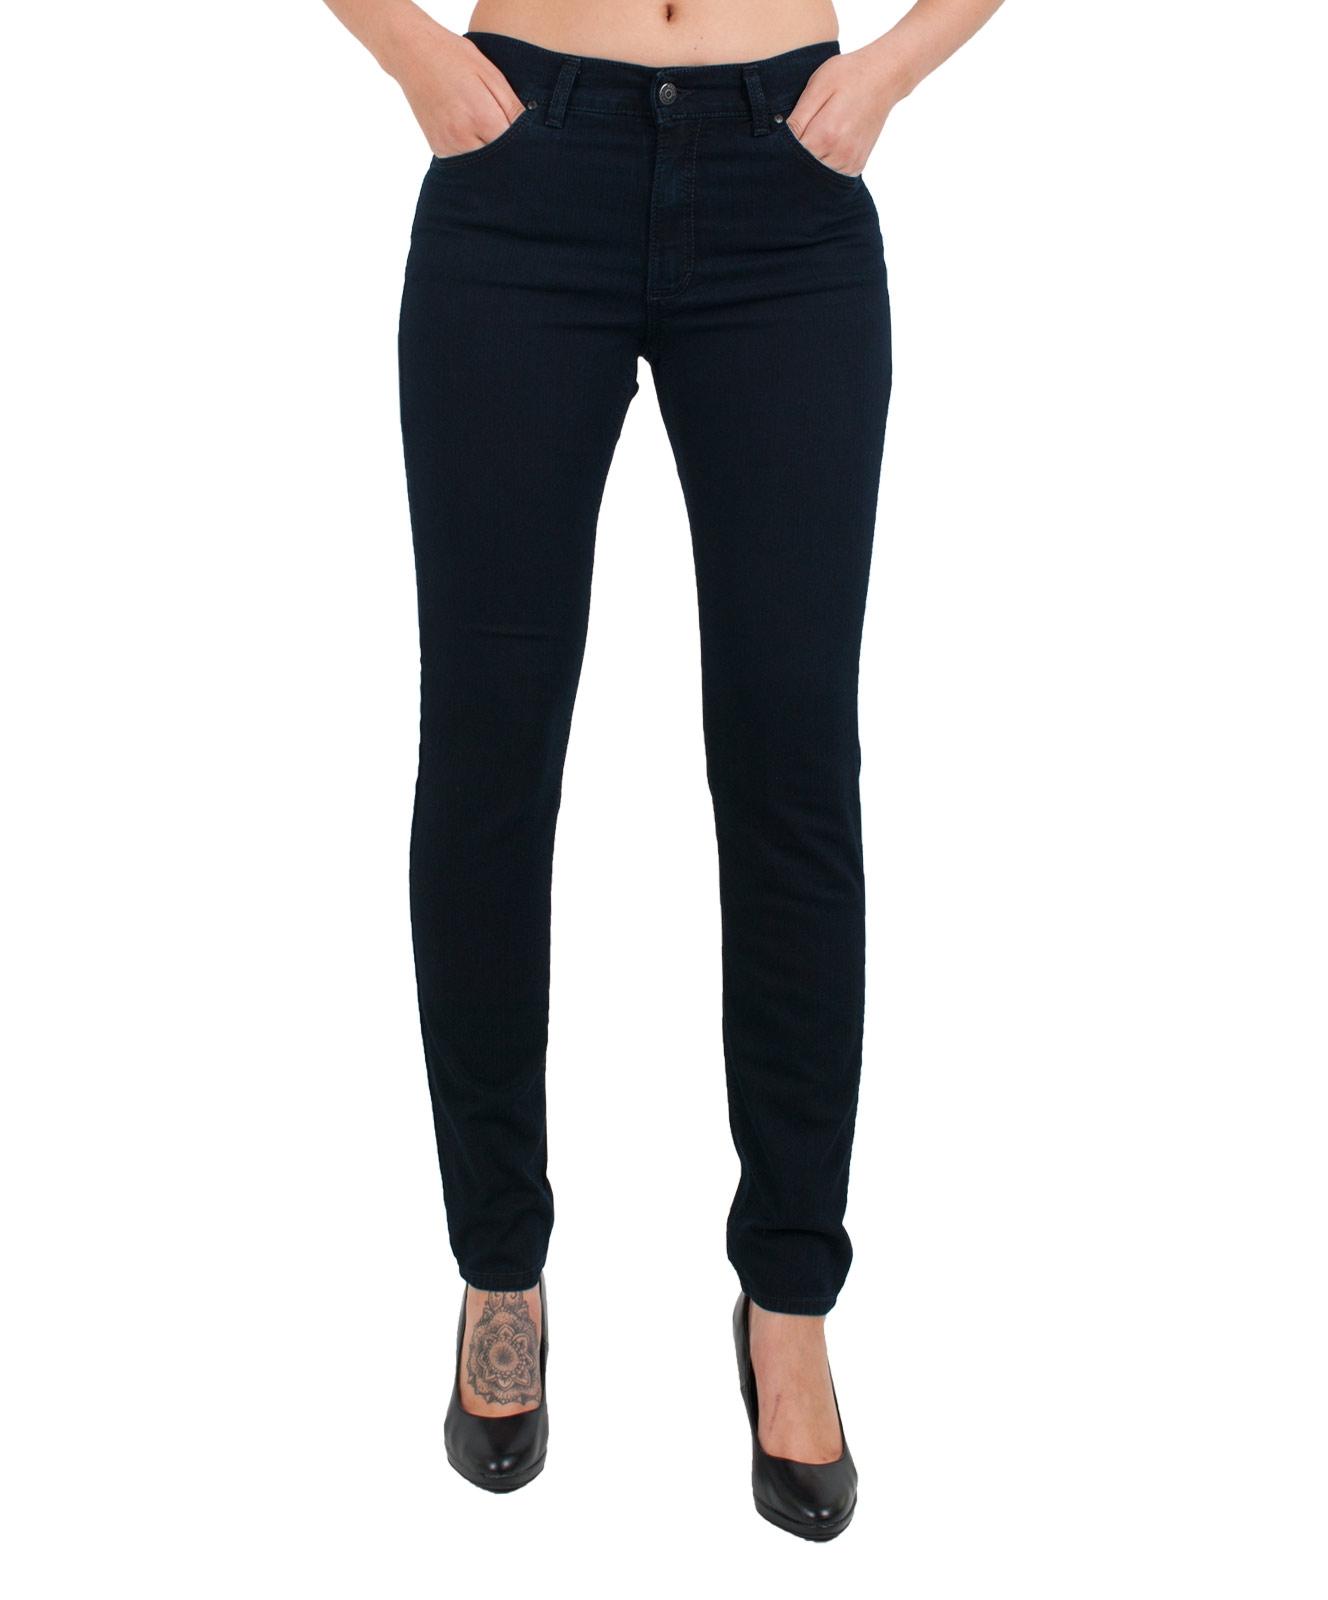 Hosen - Angels Jeans Röhre Skinny in Blue Blue  - Onlineshop Jeans Meile